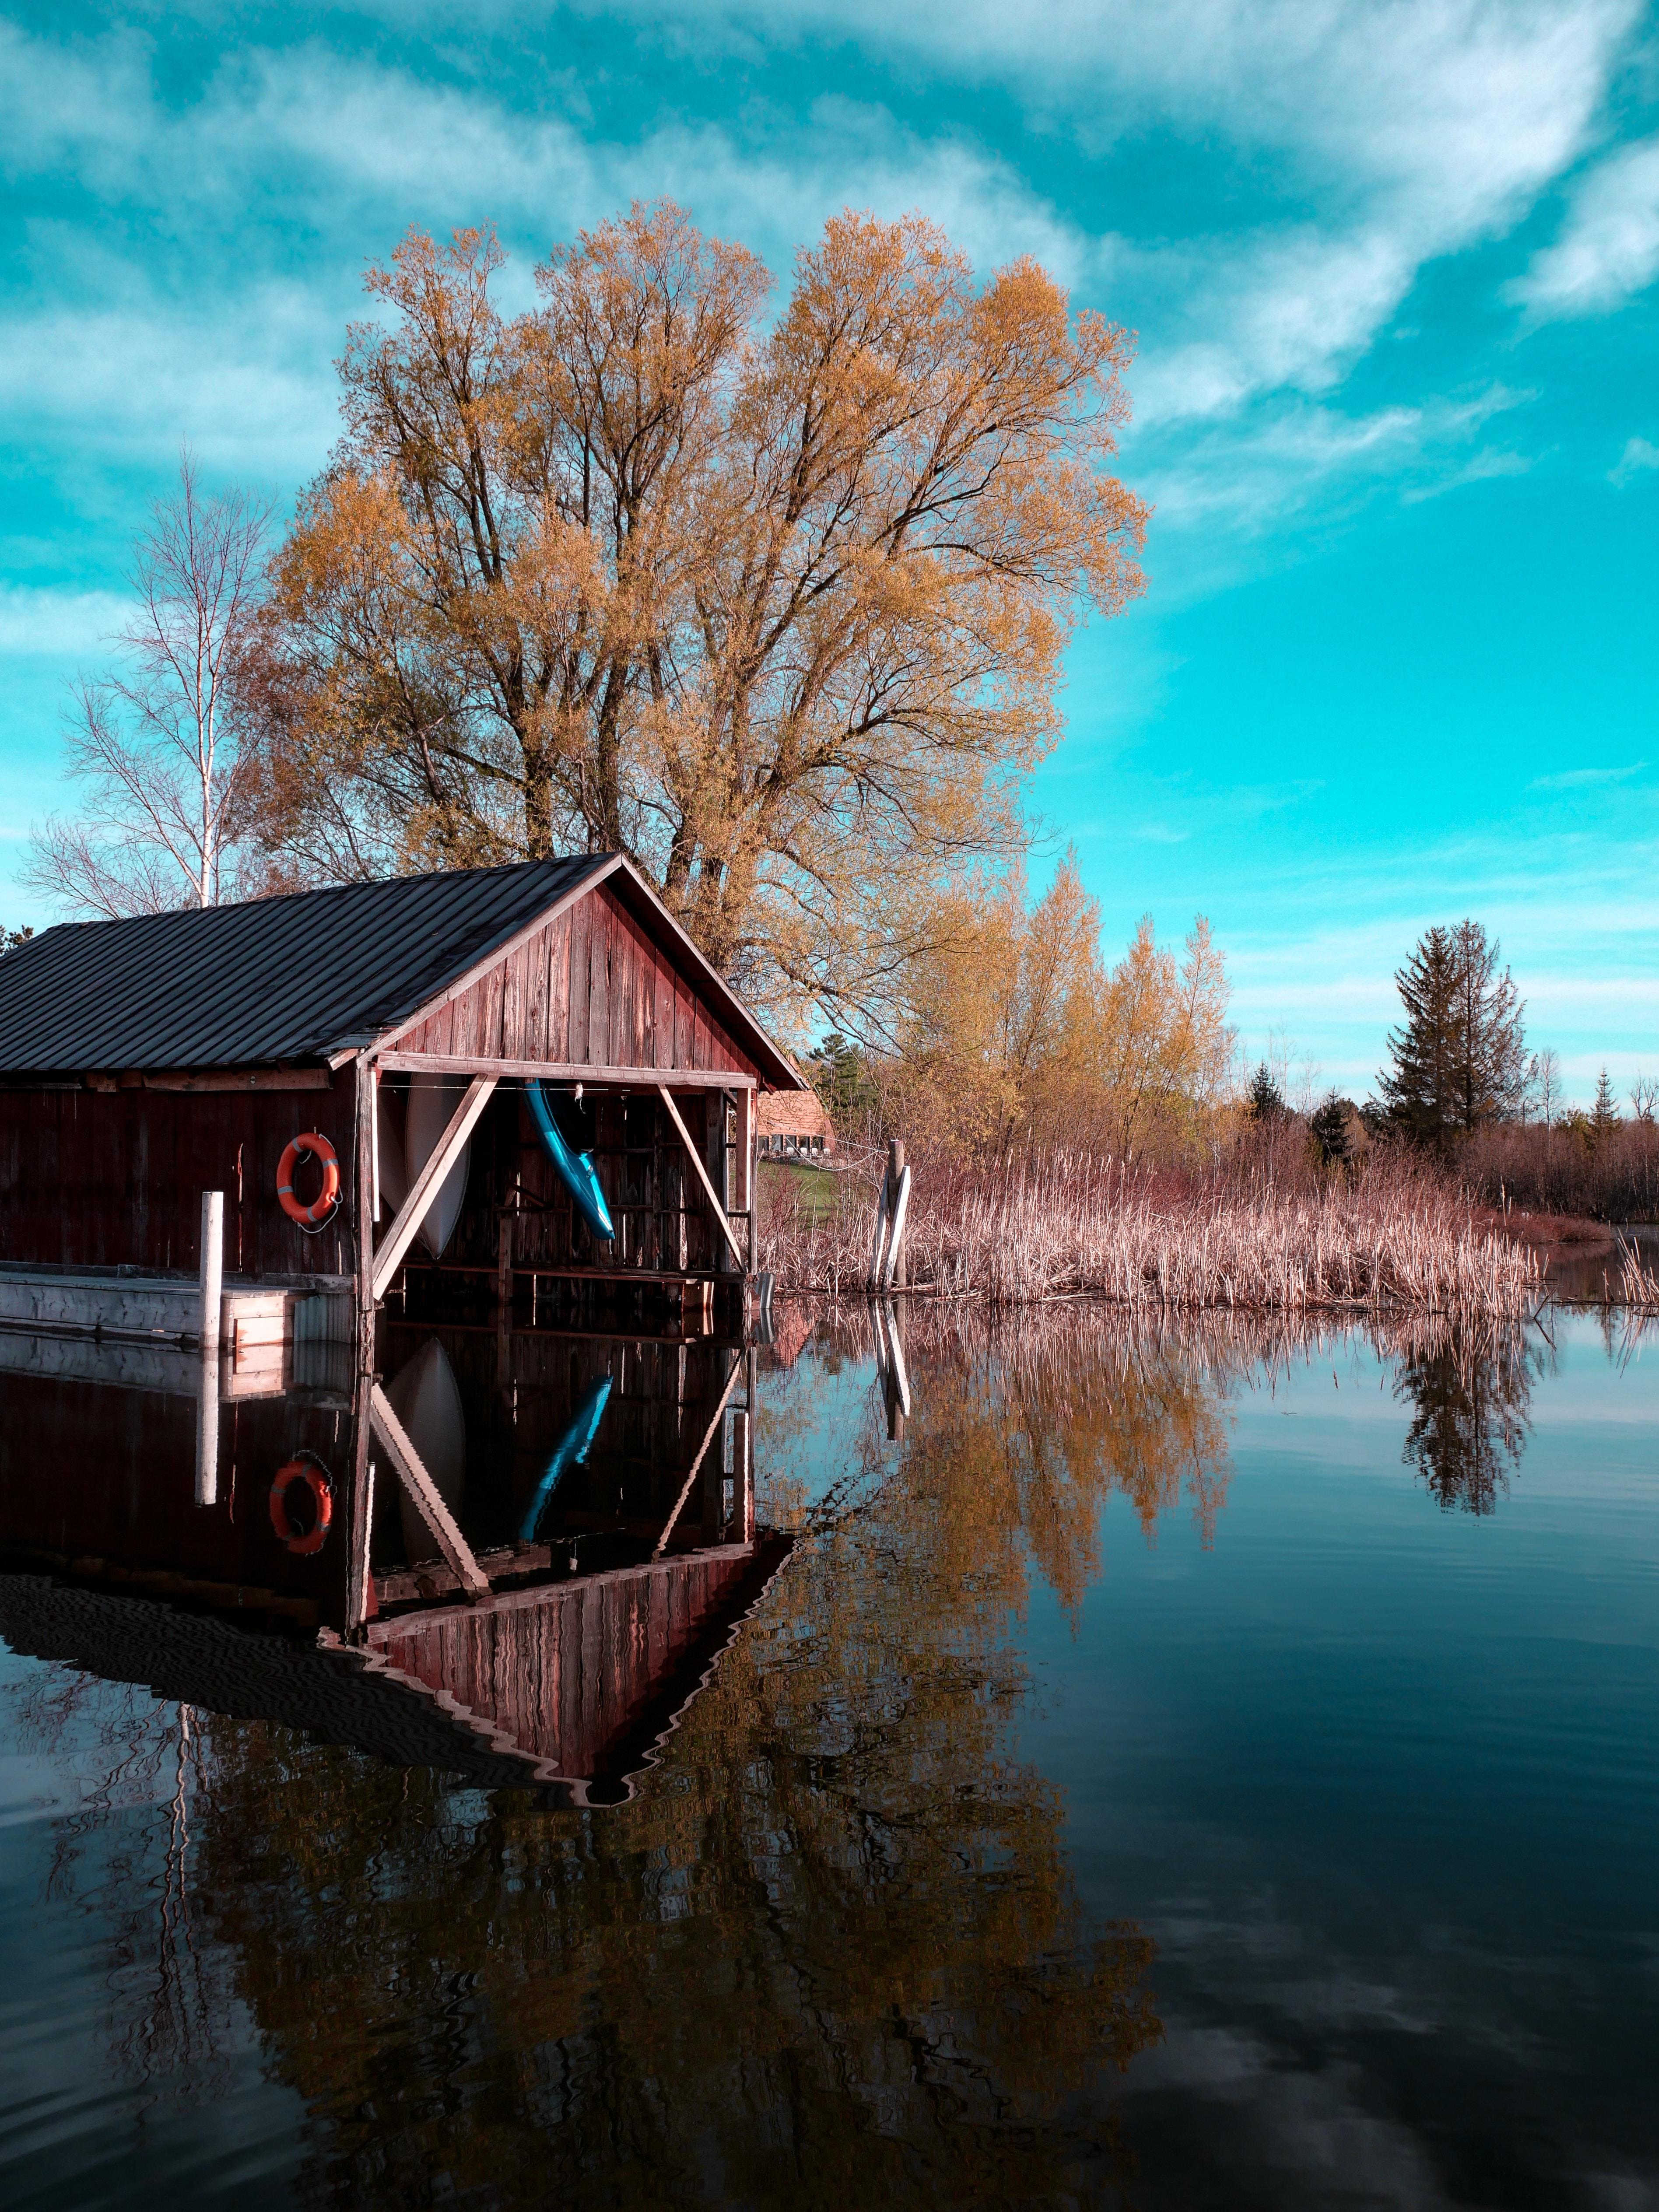 brown wooden dock near green leafed tree